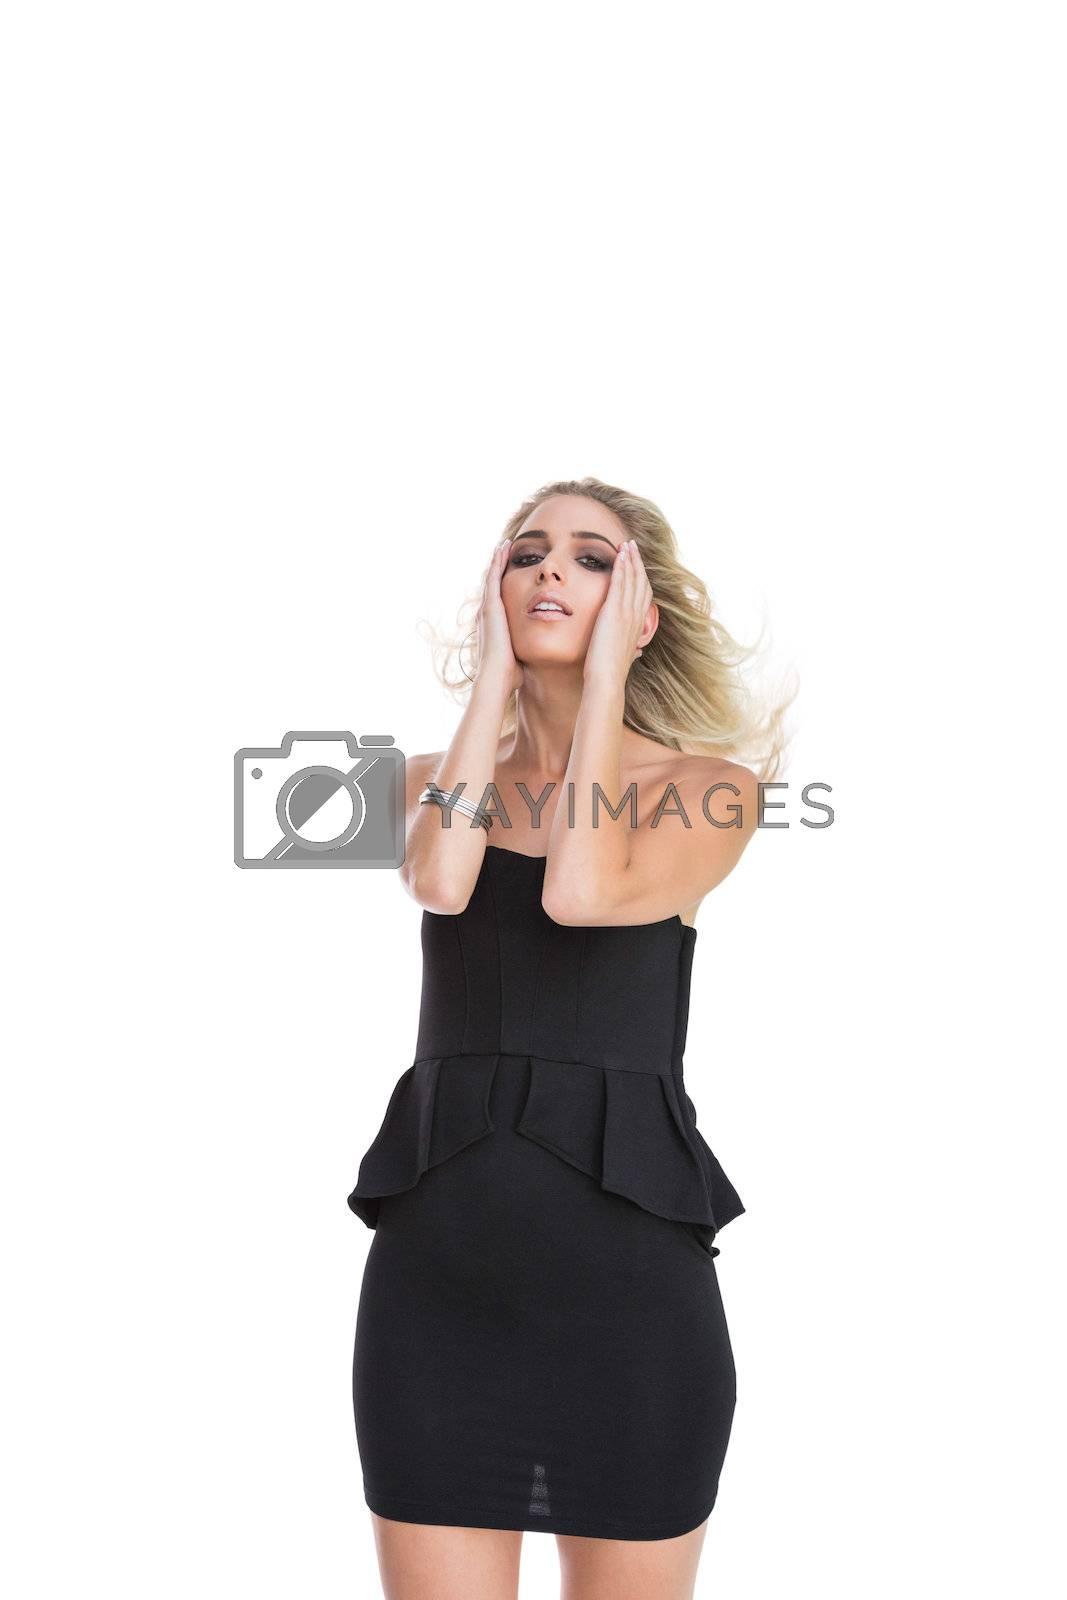 Gorgeous blonde wearing black dress  by Wavebreakmedia